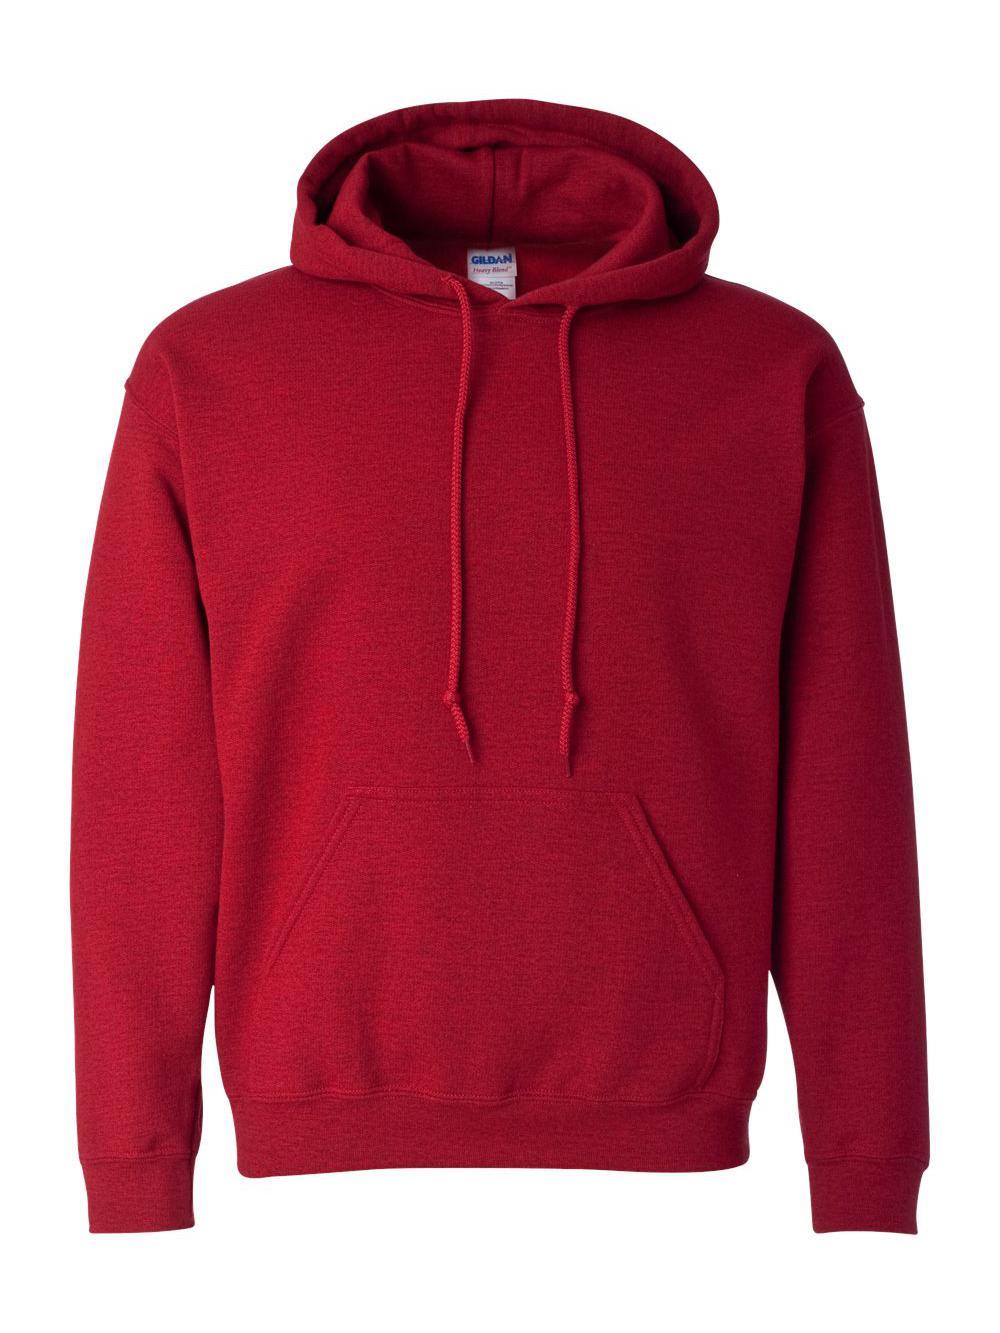 Gildan-Heavy-Blend-Hooded-Sweatshirt-18500 miniatura 3